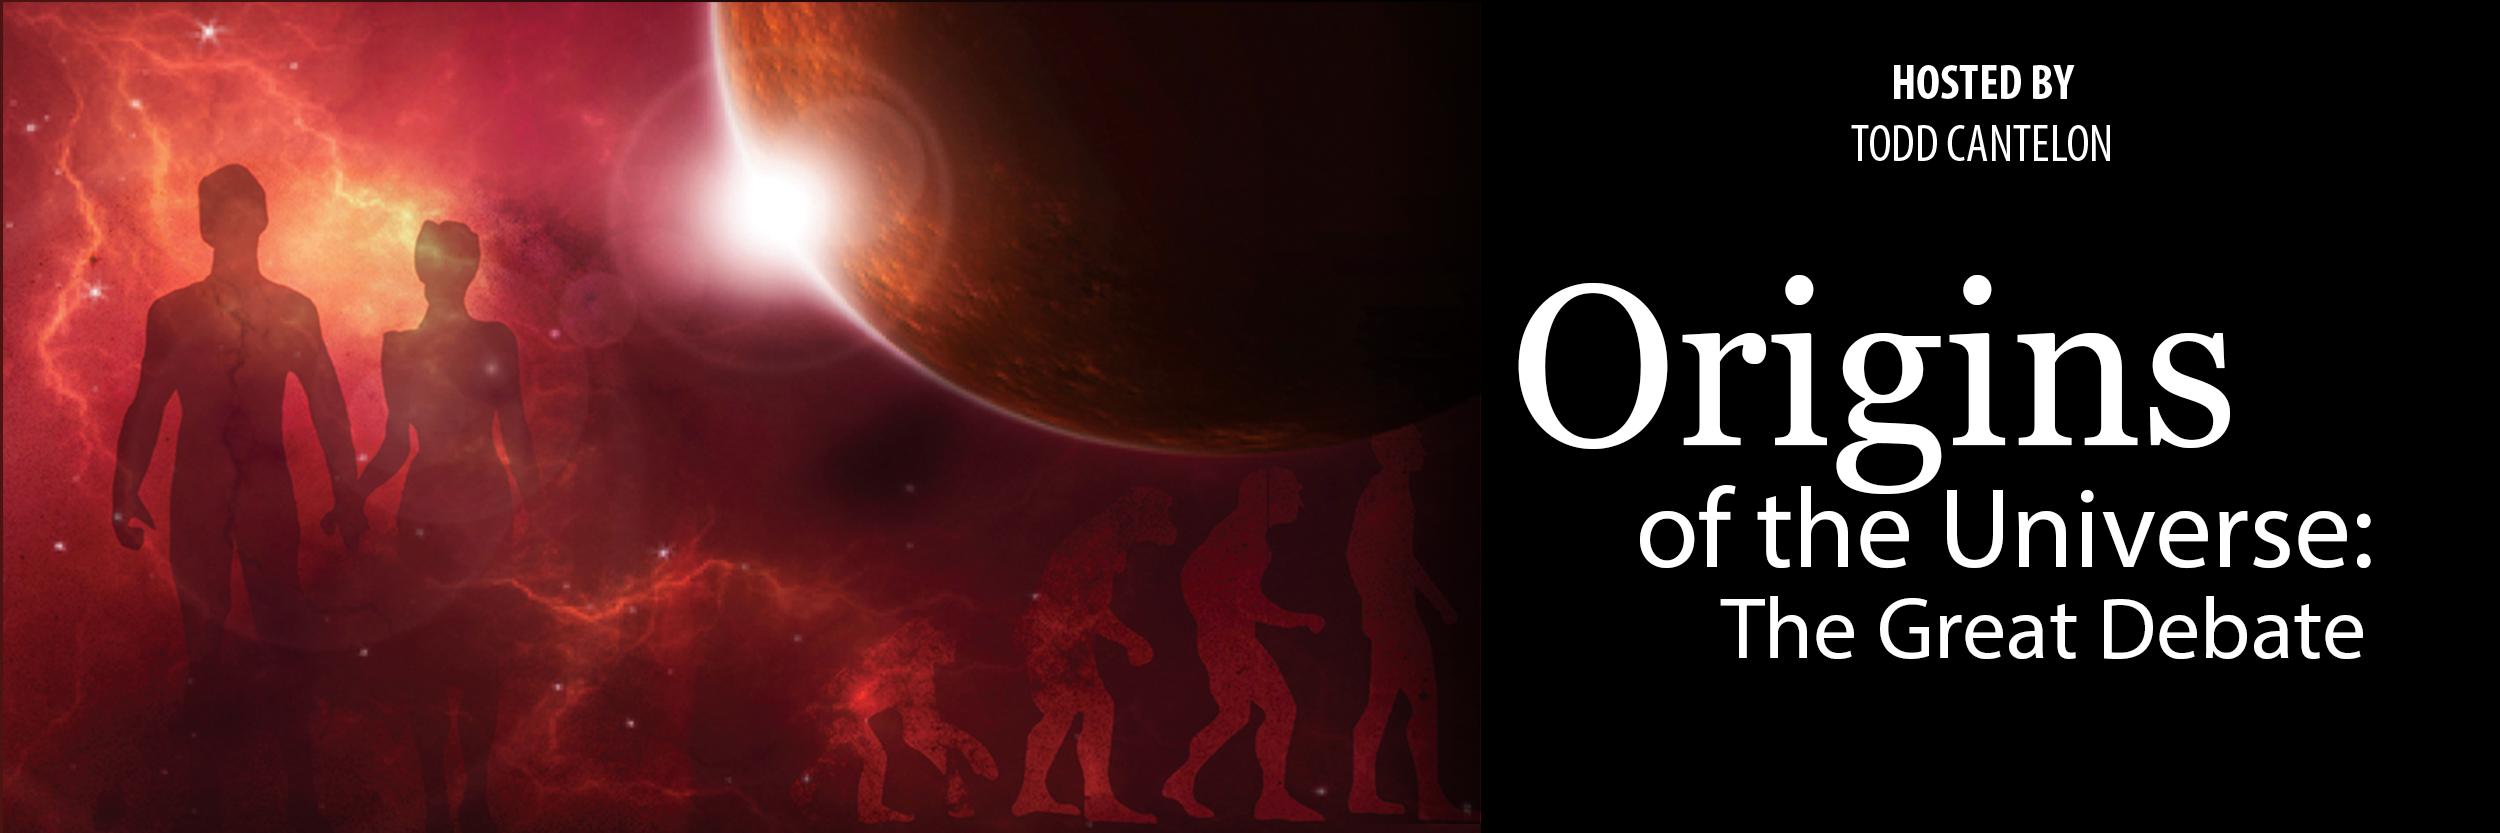 Origins of the Universe Slider